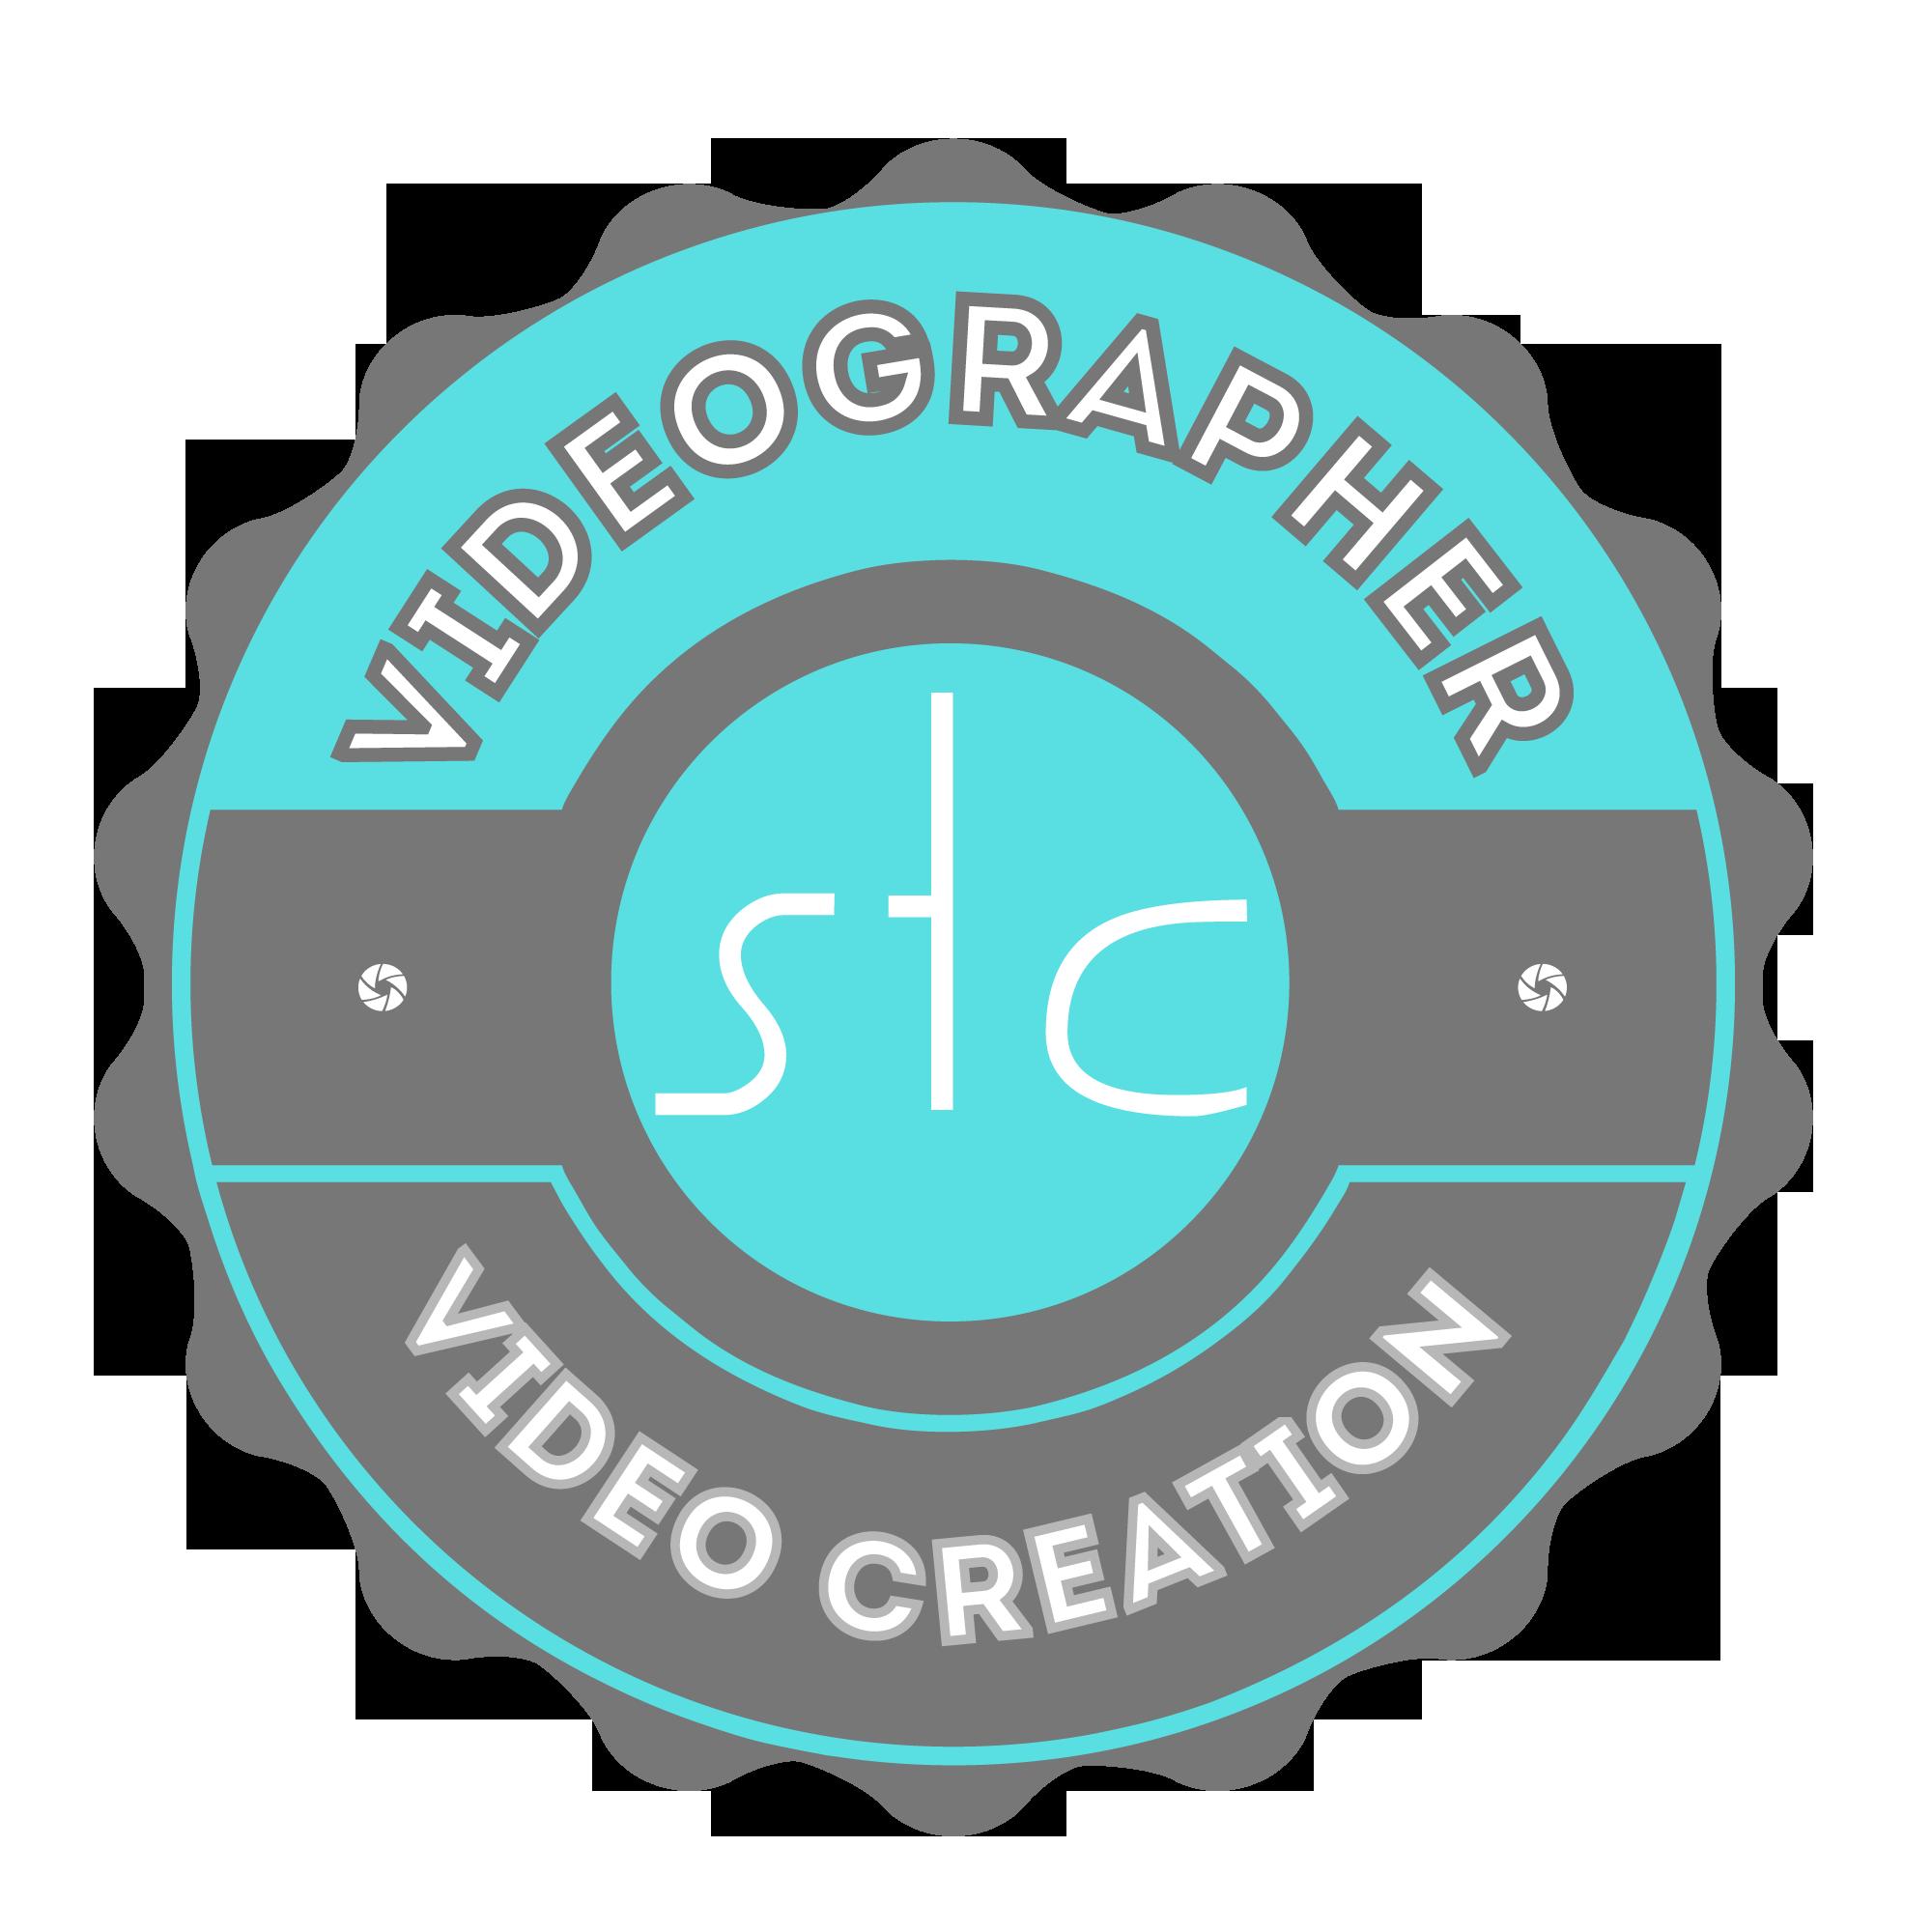 STC Videographer